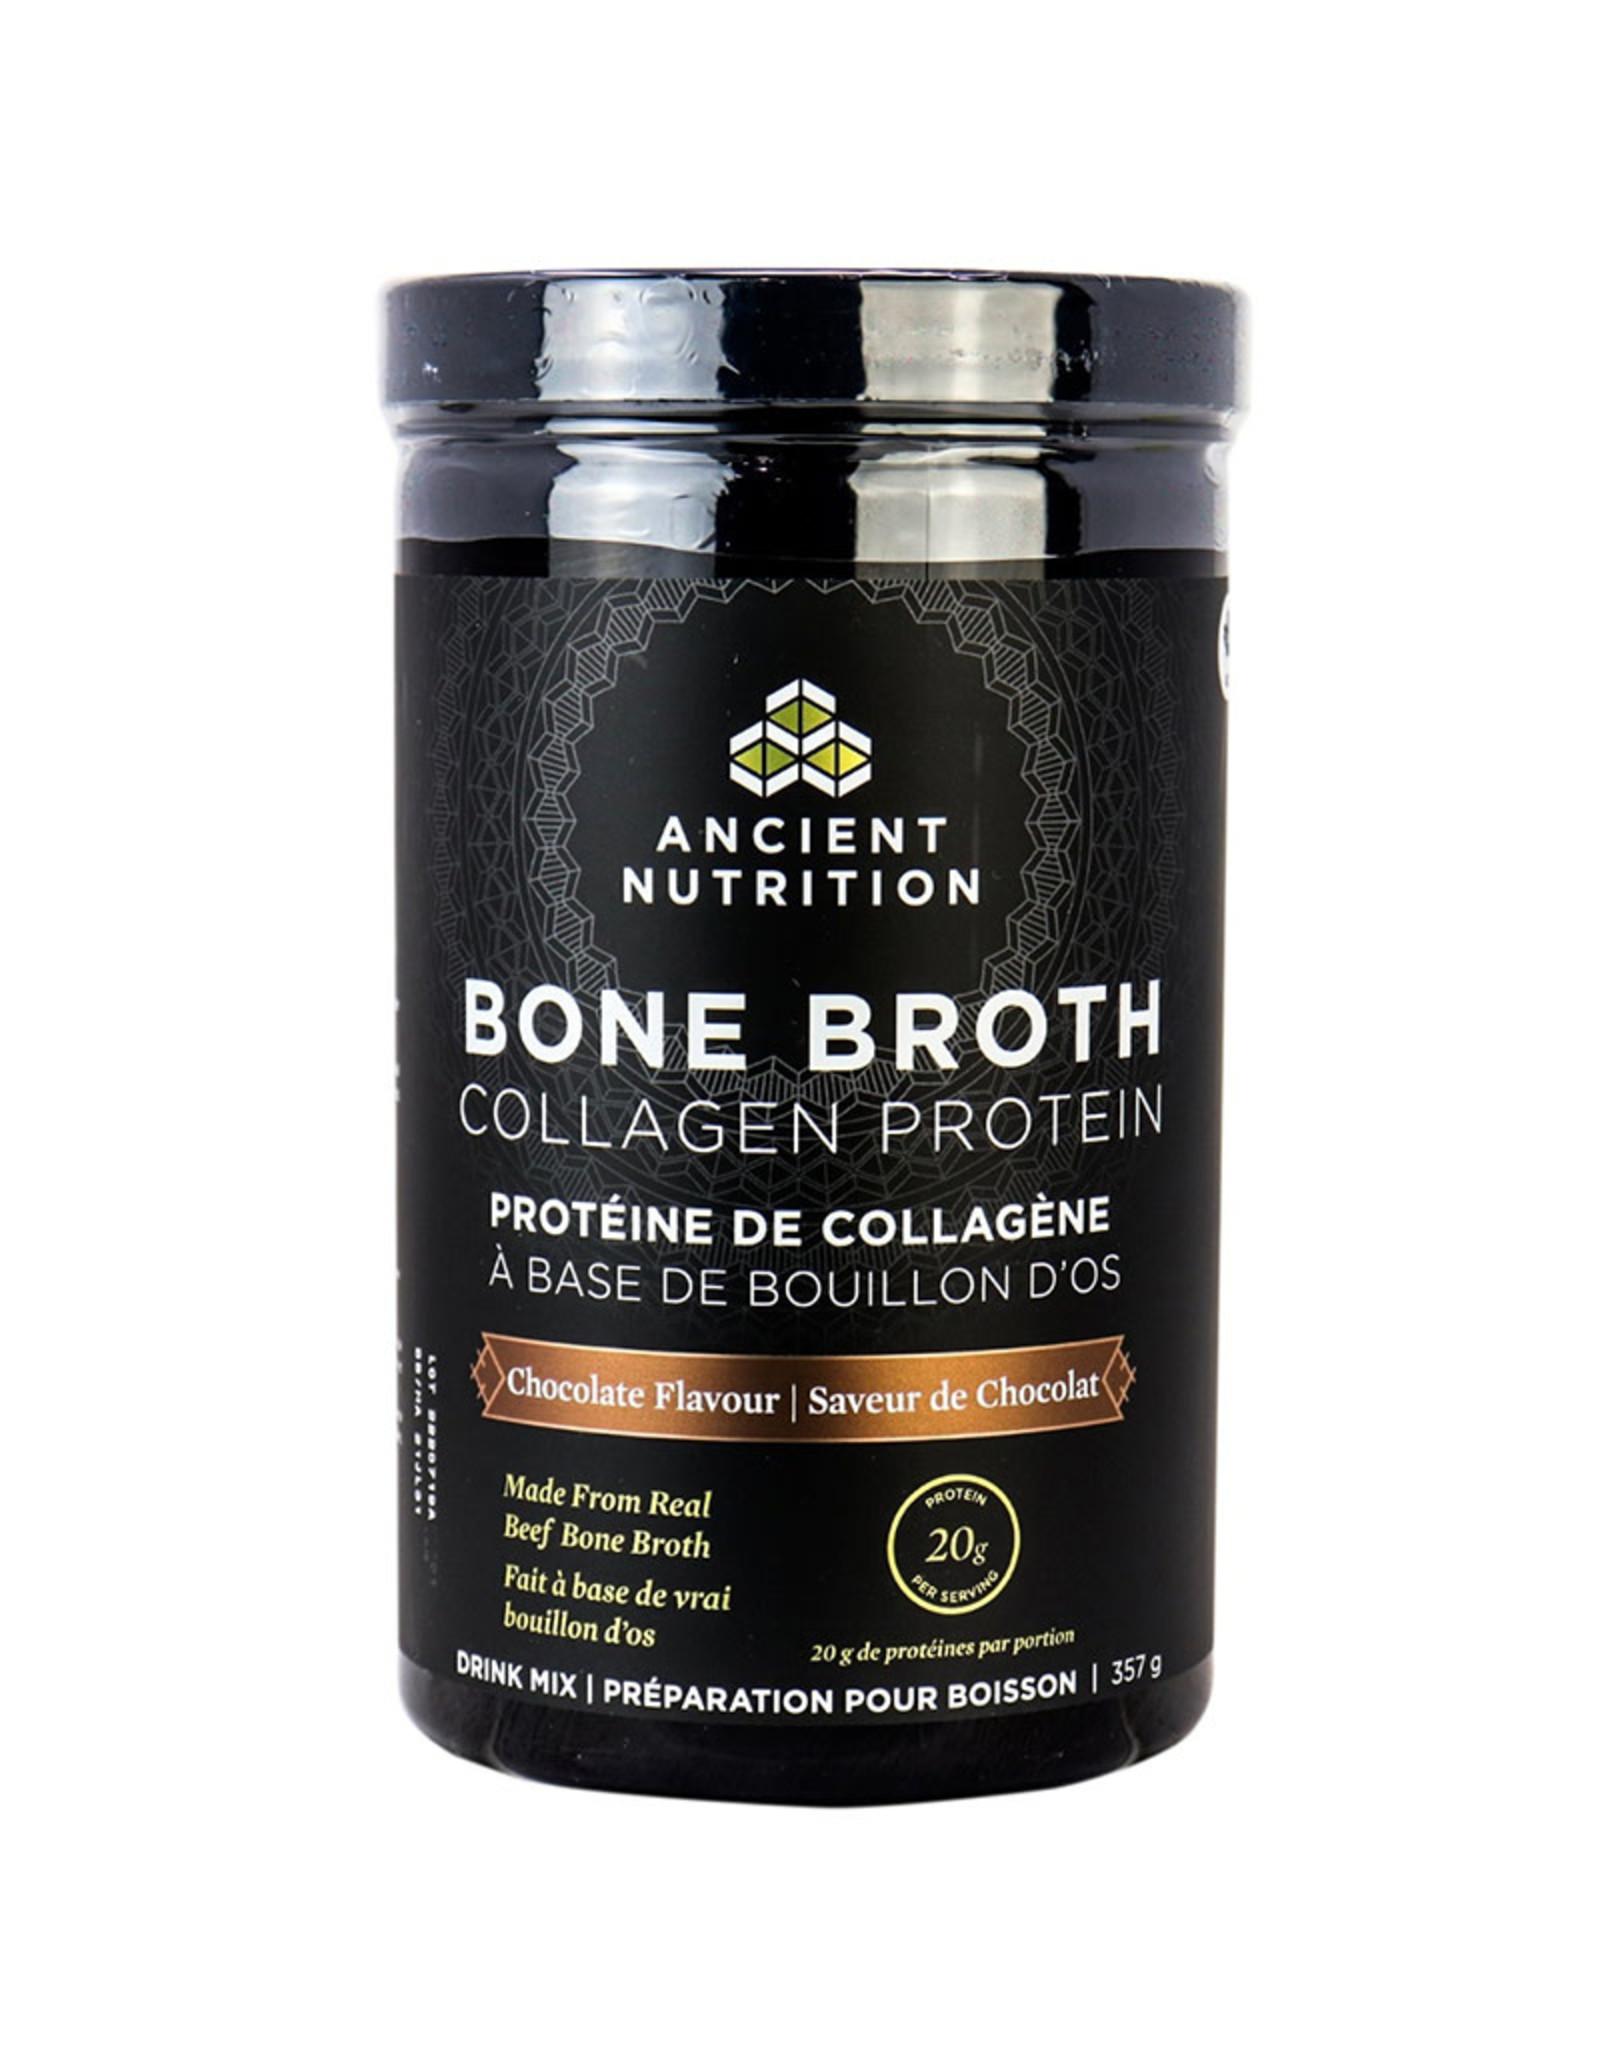 Ancient Nutrition Ancient Nutrition - Bone Broth Collagen Protein, Chocolate (357g)